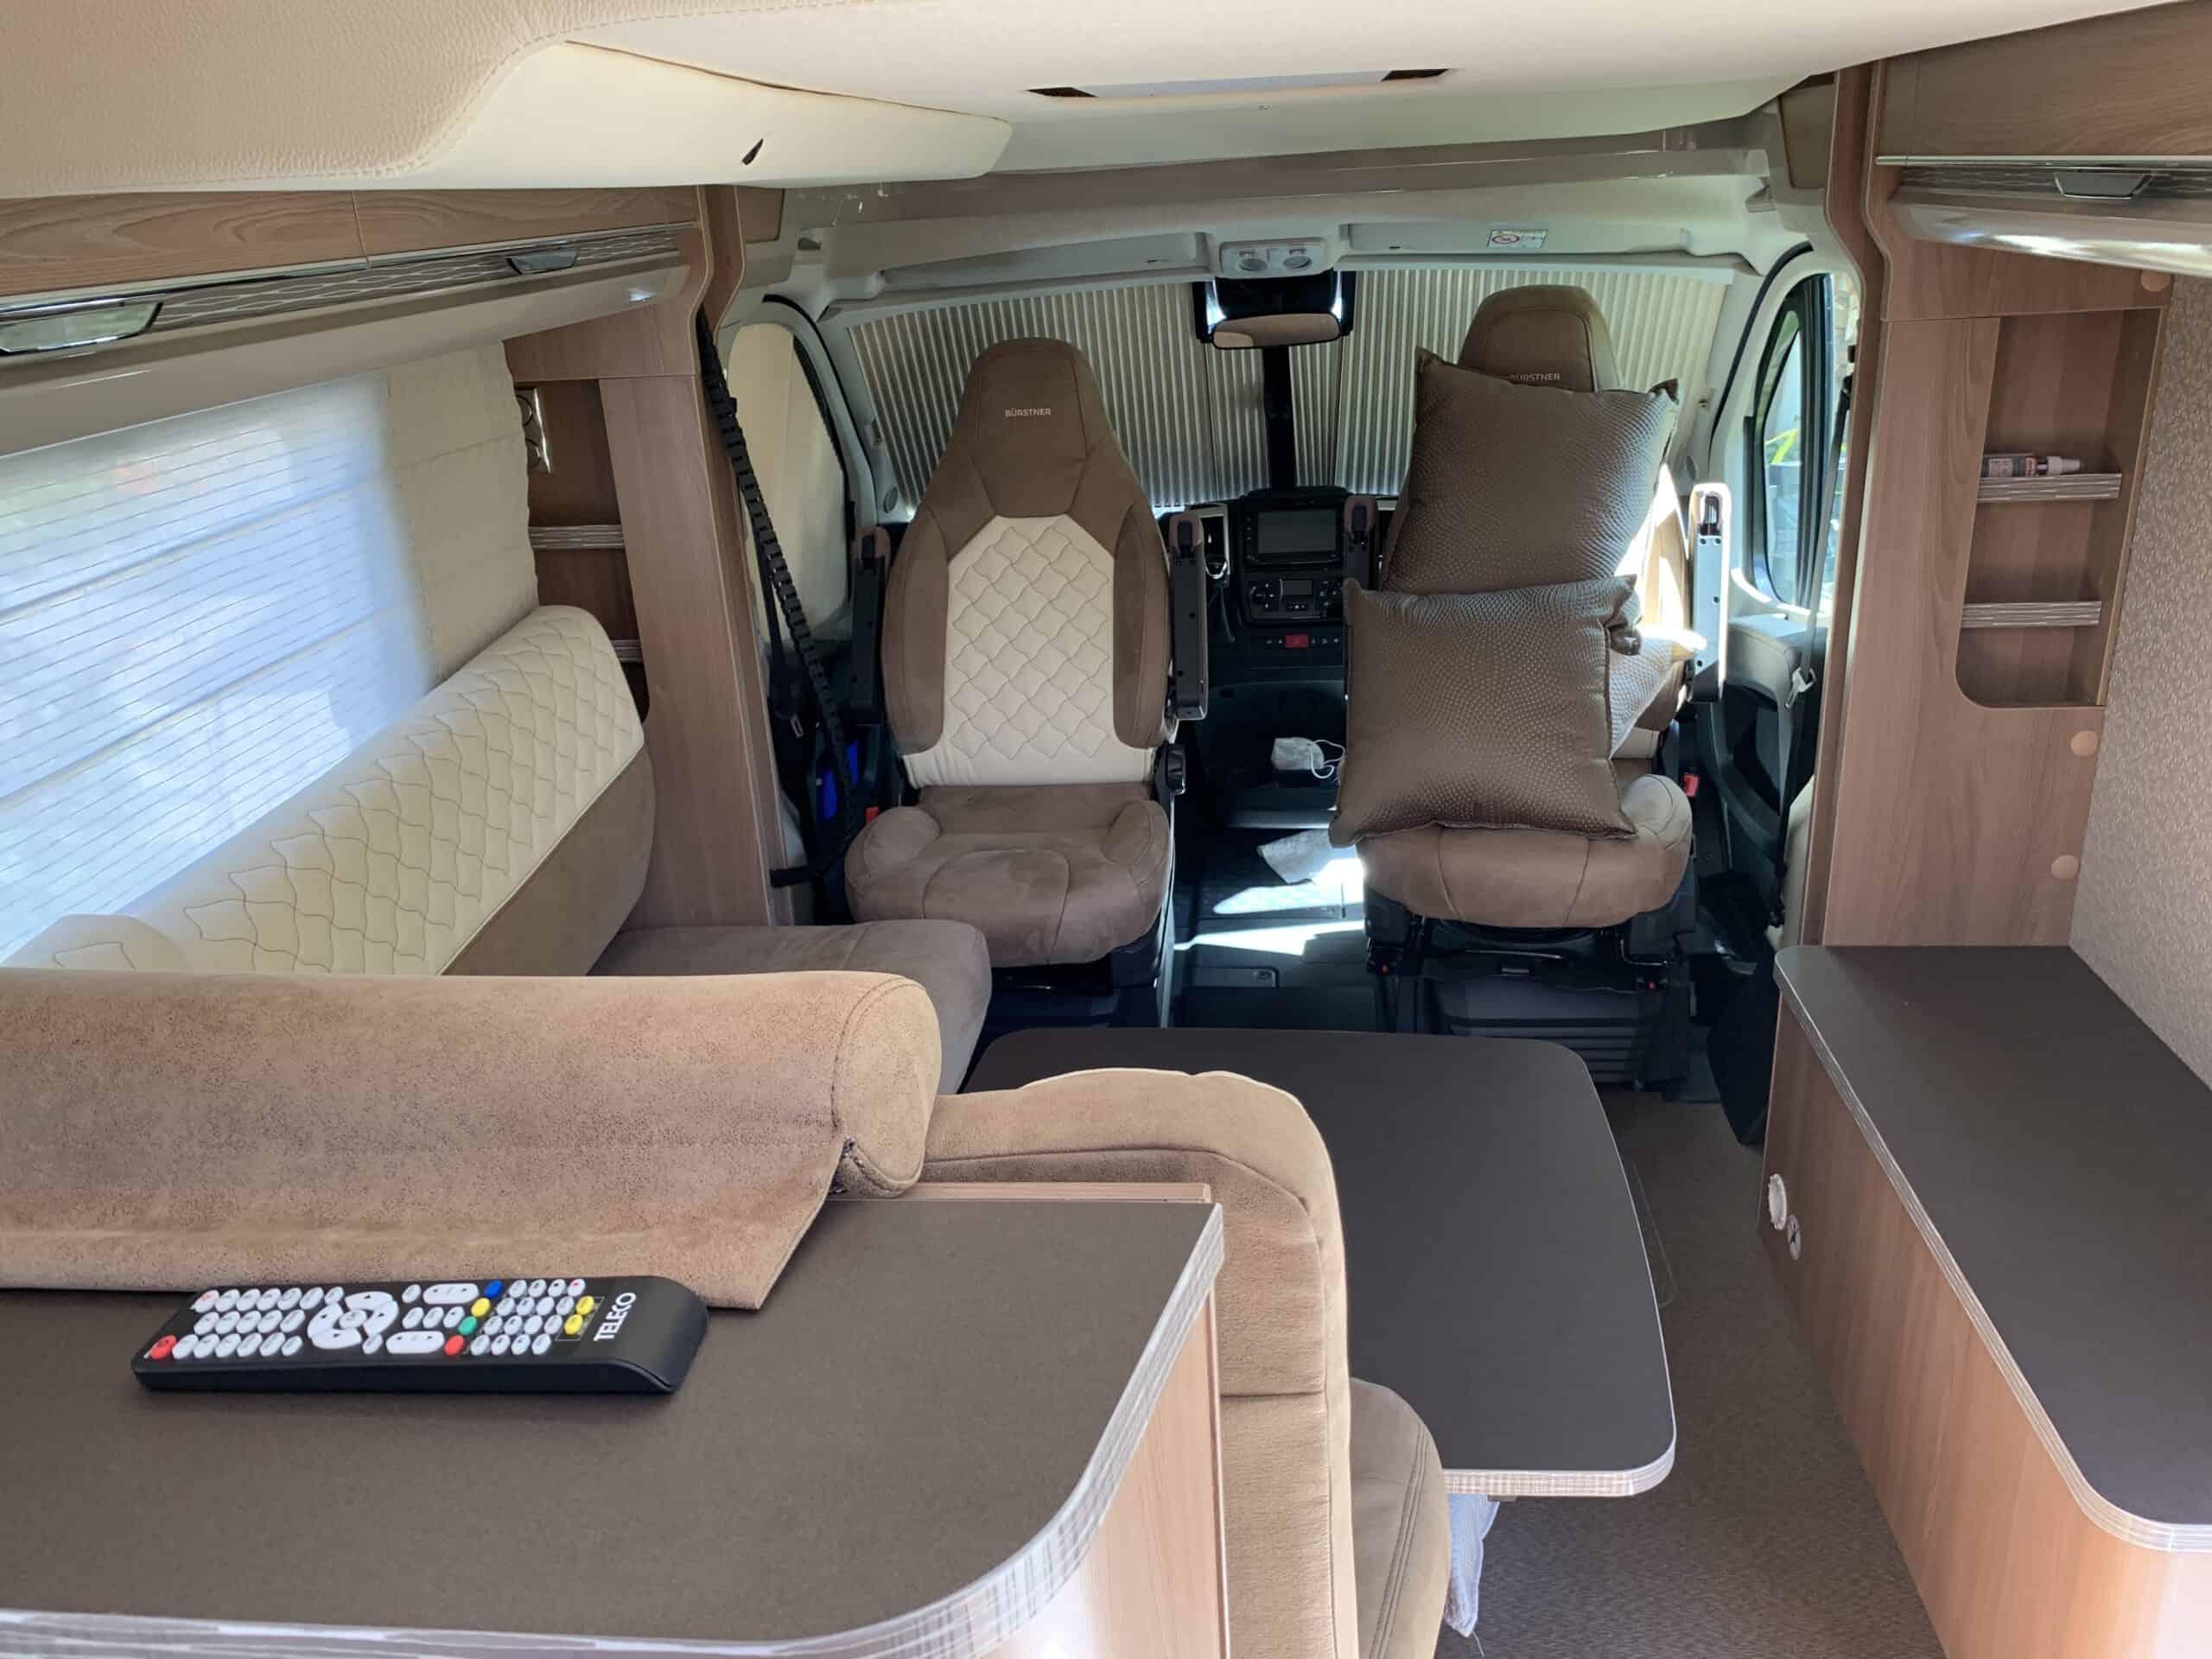 Bürstner Ixeo 680 TL - Reisemobil für Verliebte